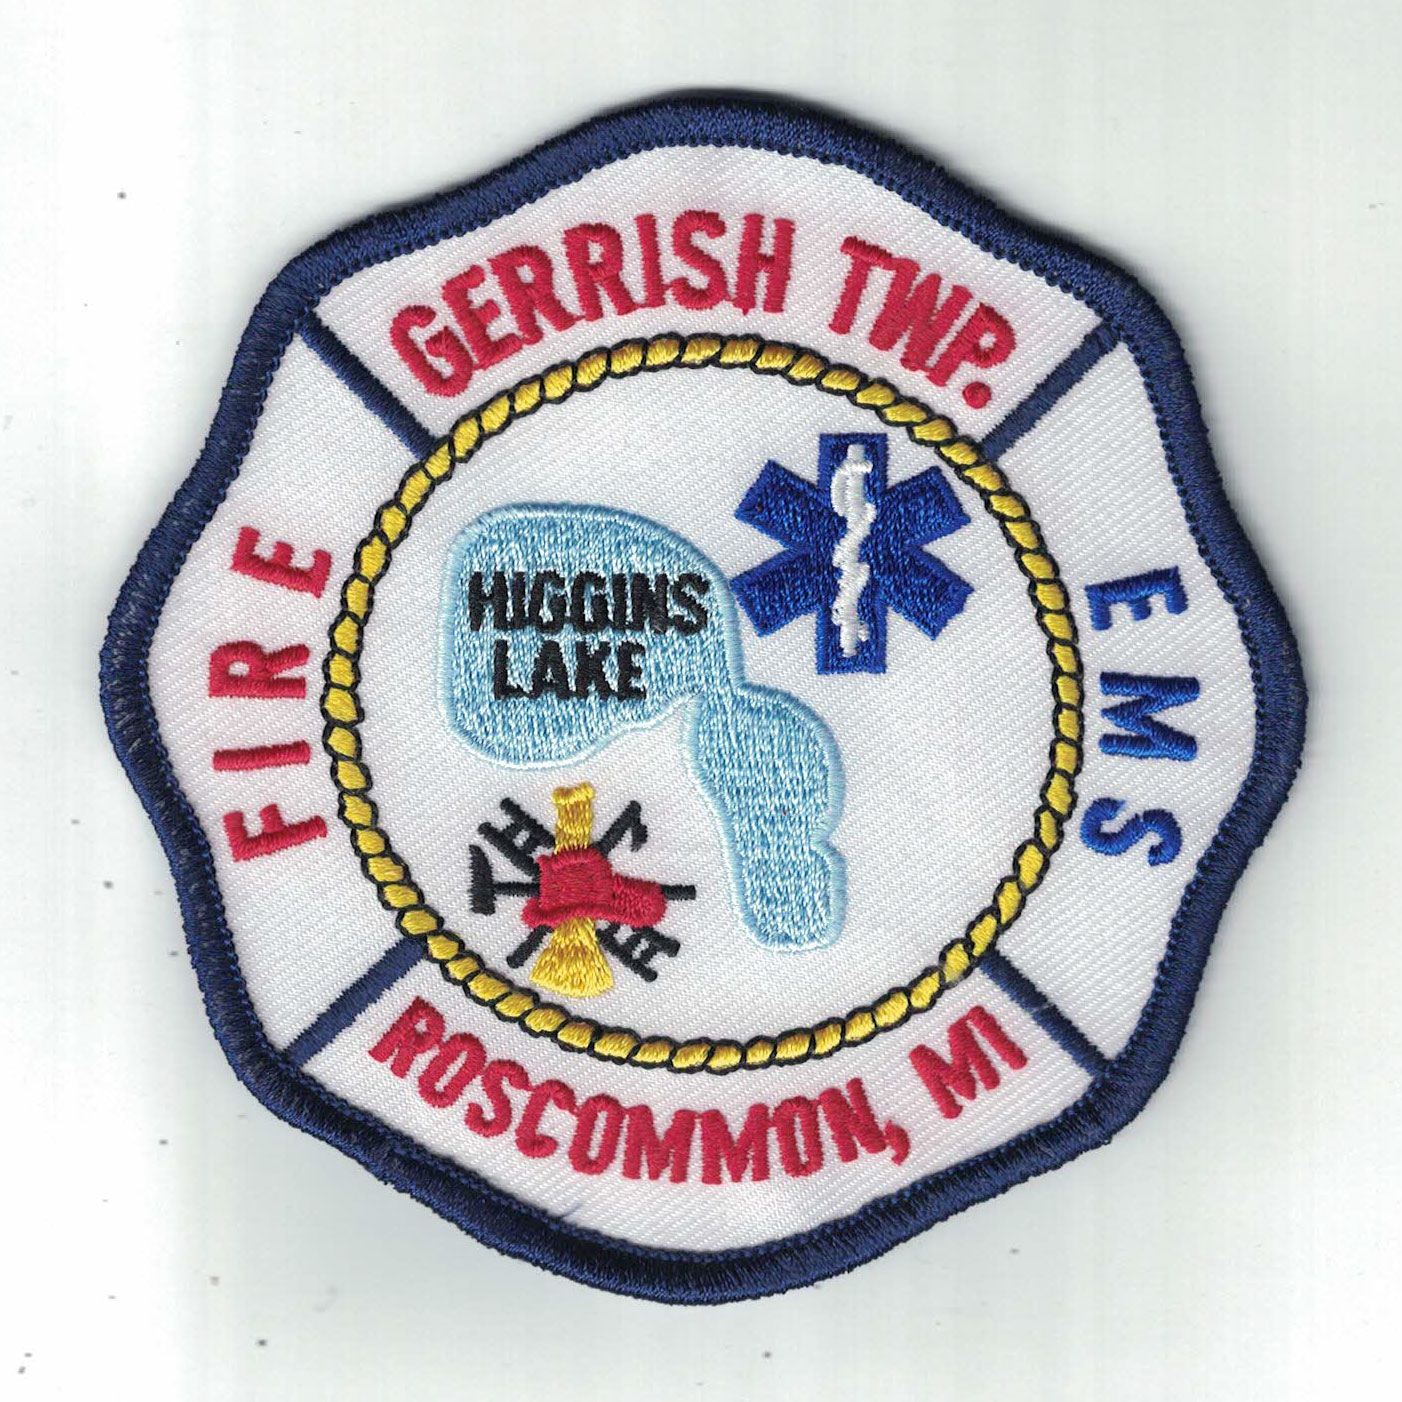 Gerrish Fire Fighters Association patch